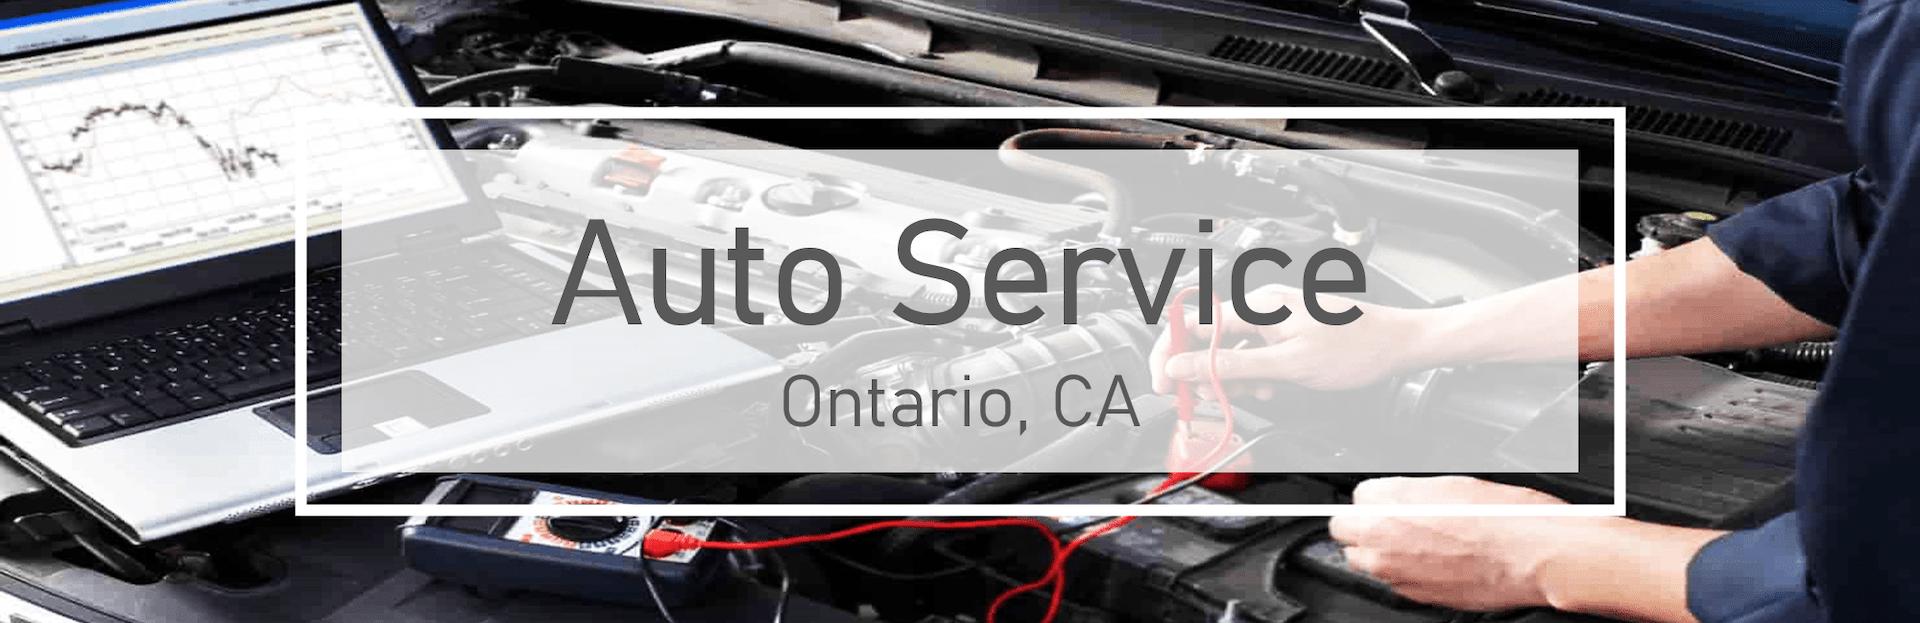 Auto Service Ontario